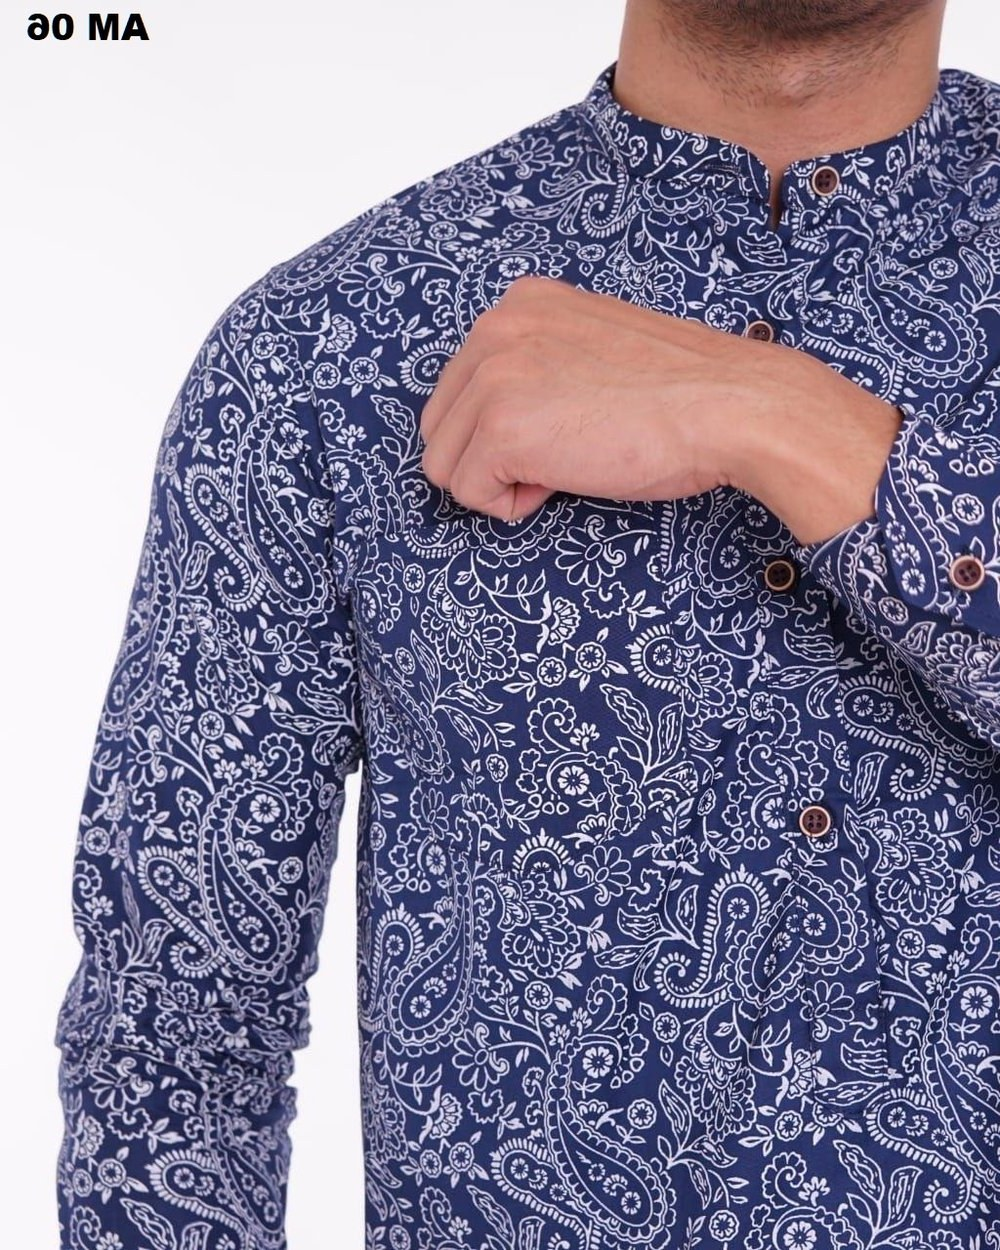 Ide Baju Lebaran Pria Keren Txdf Jual Hm20 Baju Koko Pakistan Modern Koko Pria Dewasa Batik